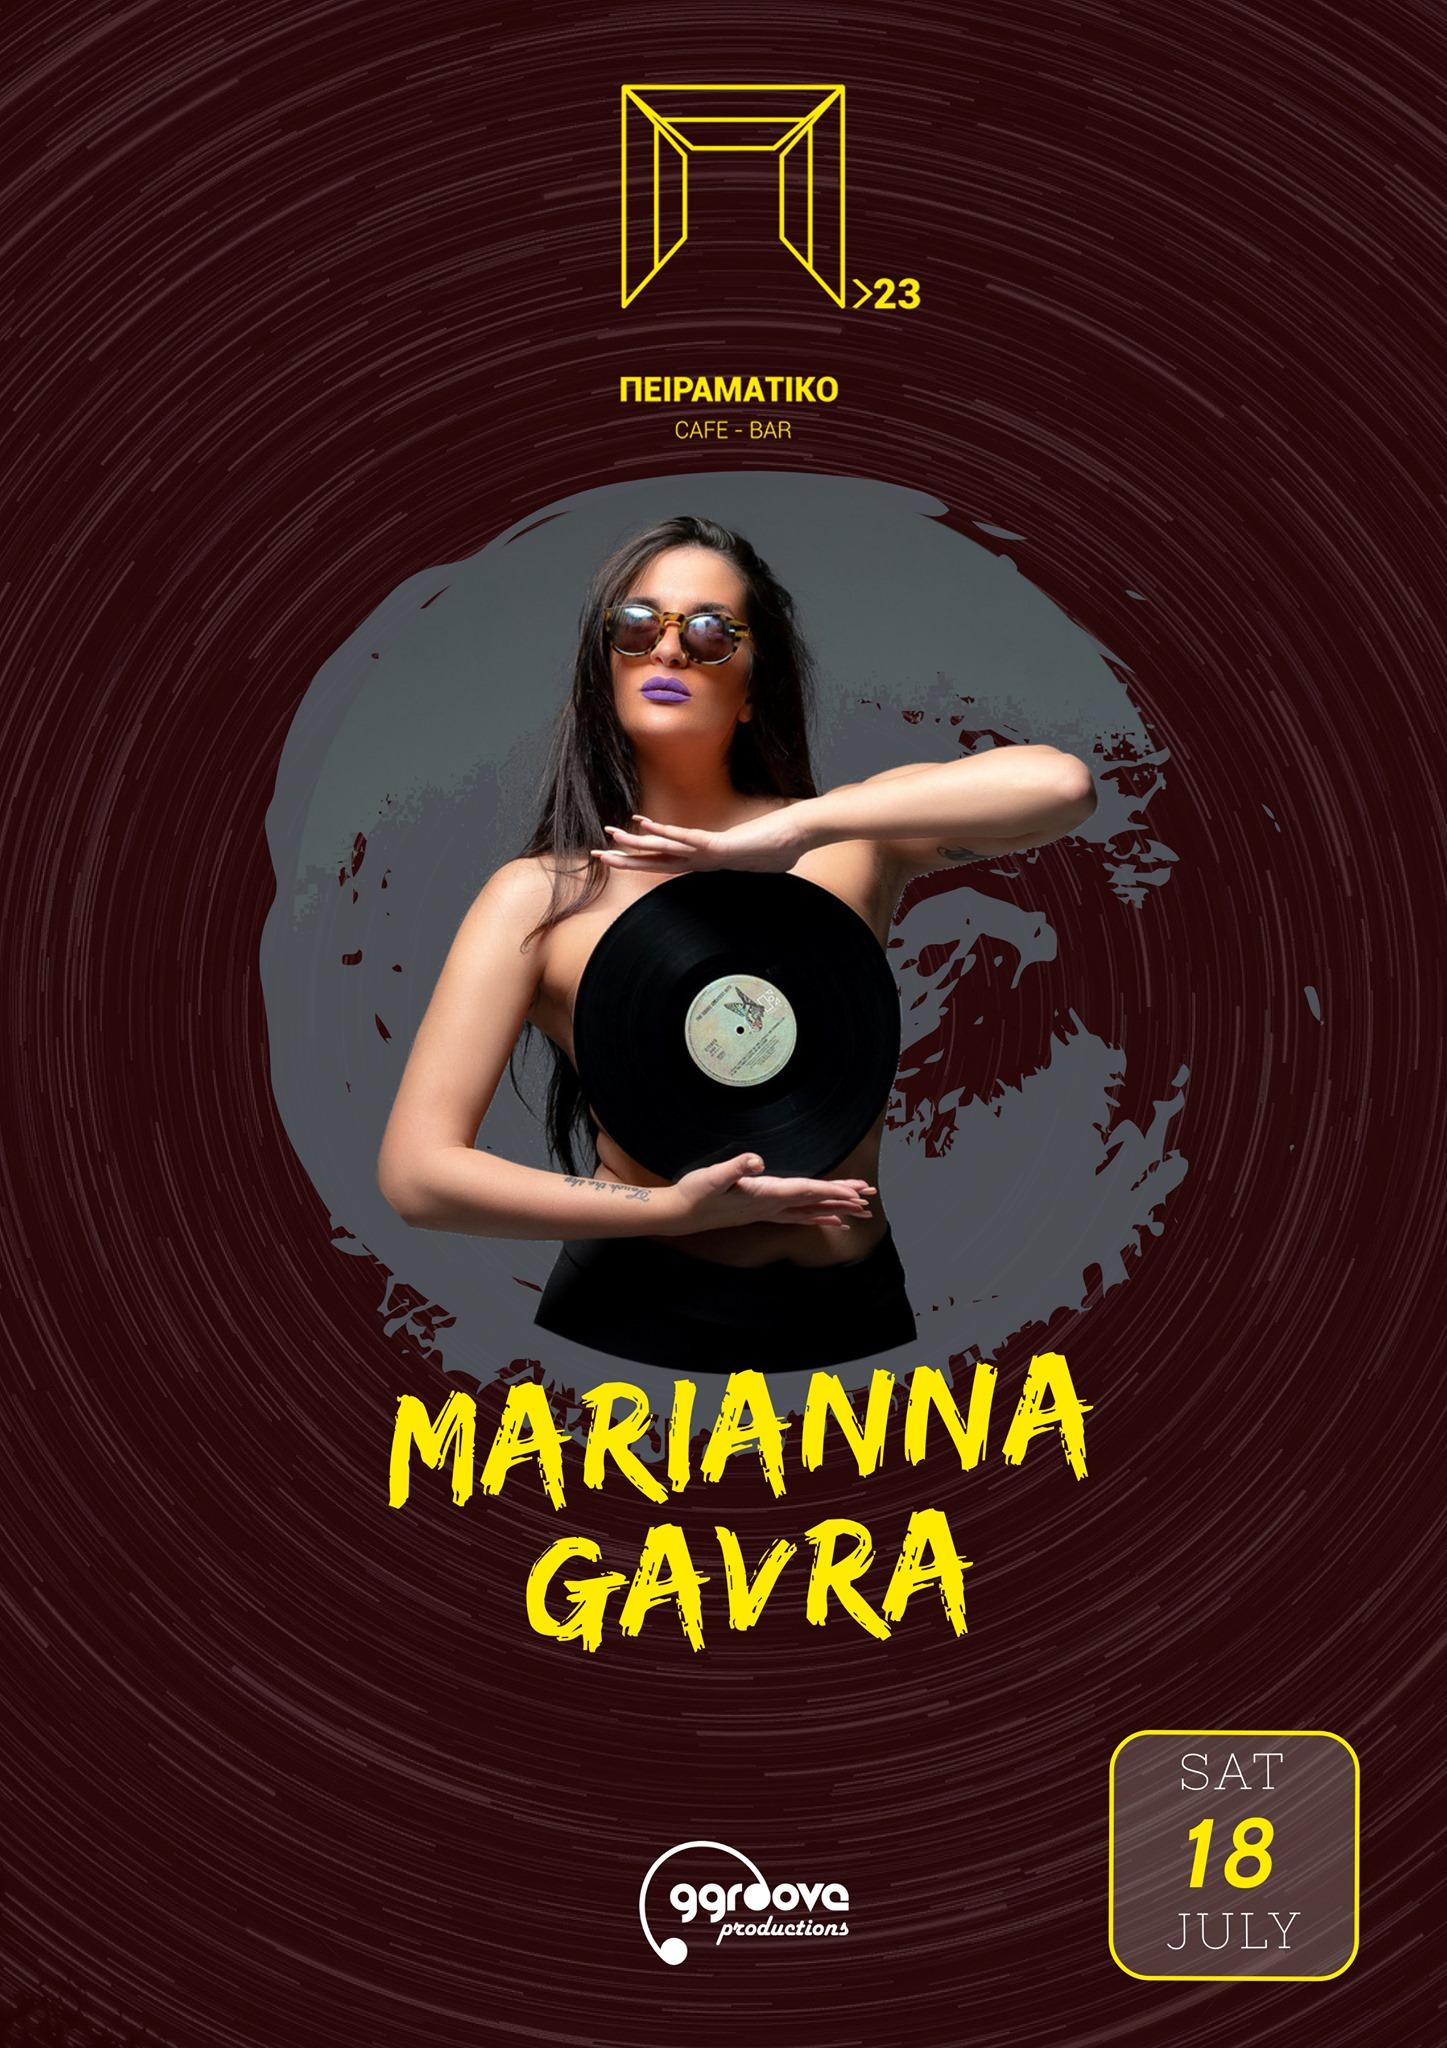 Marianna Gavra at Peiramatiko _ Saturday